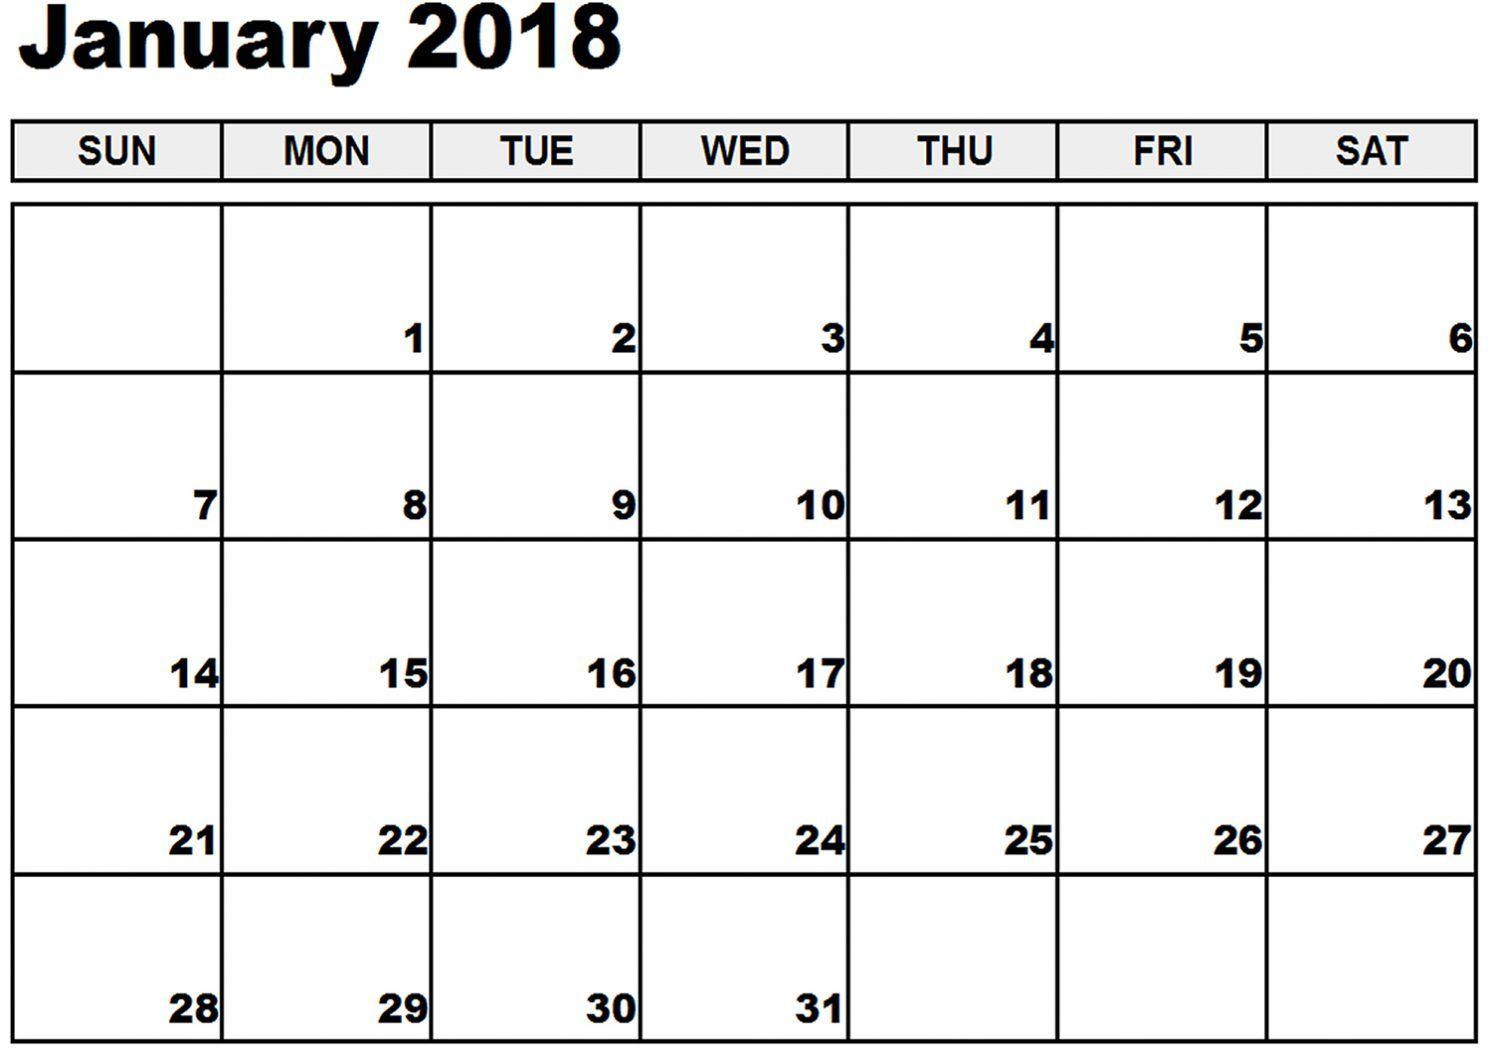 January 2018 Calendar HD 4k Wallpapers   HDWall4kCom 1492x1055